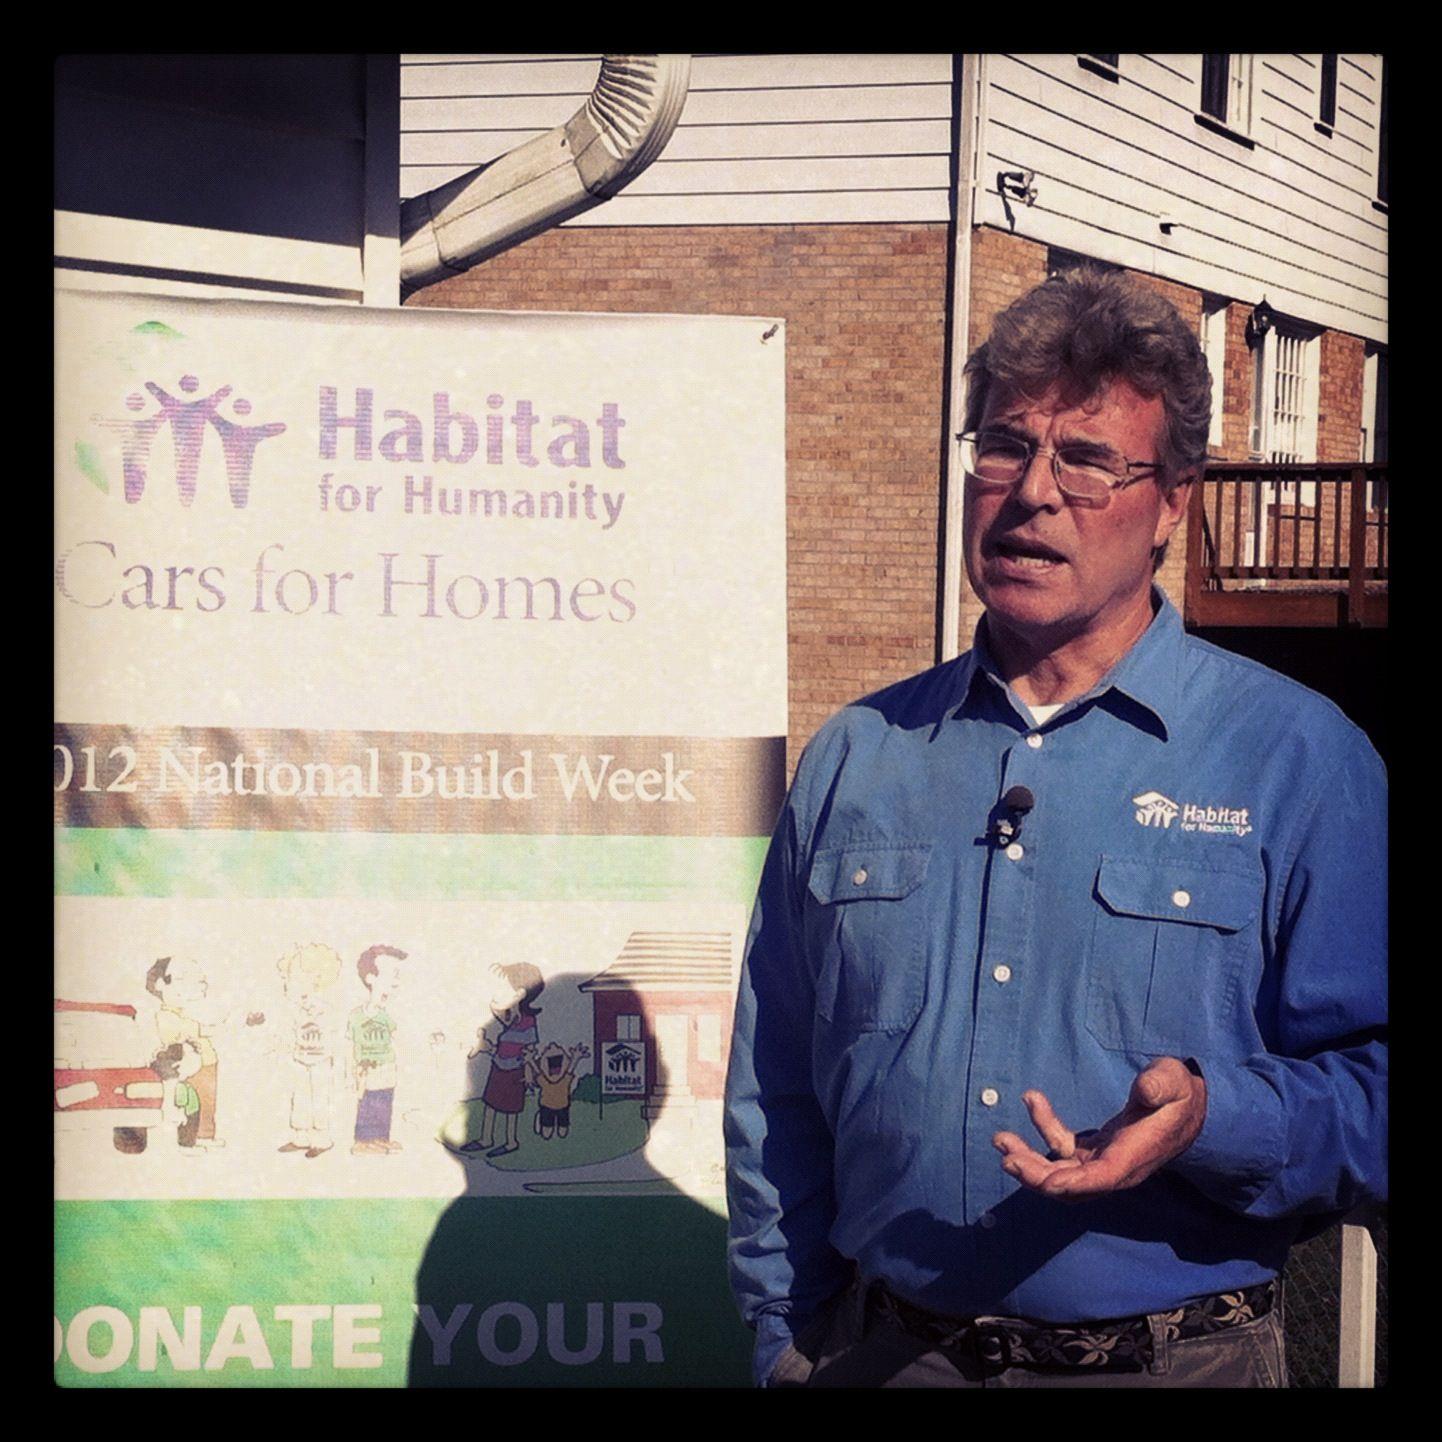 Clark howard sponsoring habitat for humanity house in tulsa - Clark Howard Sponsoring Habitat For Humanity House In Tulsa 59